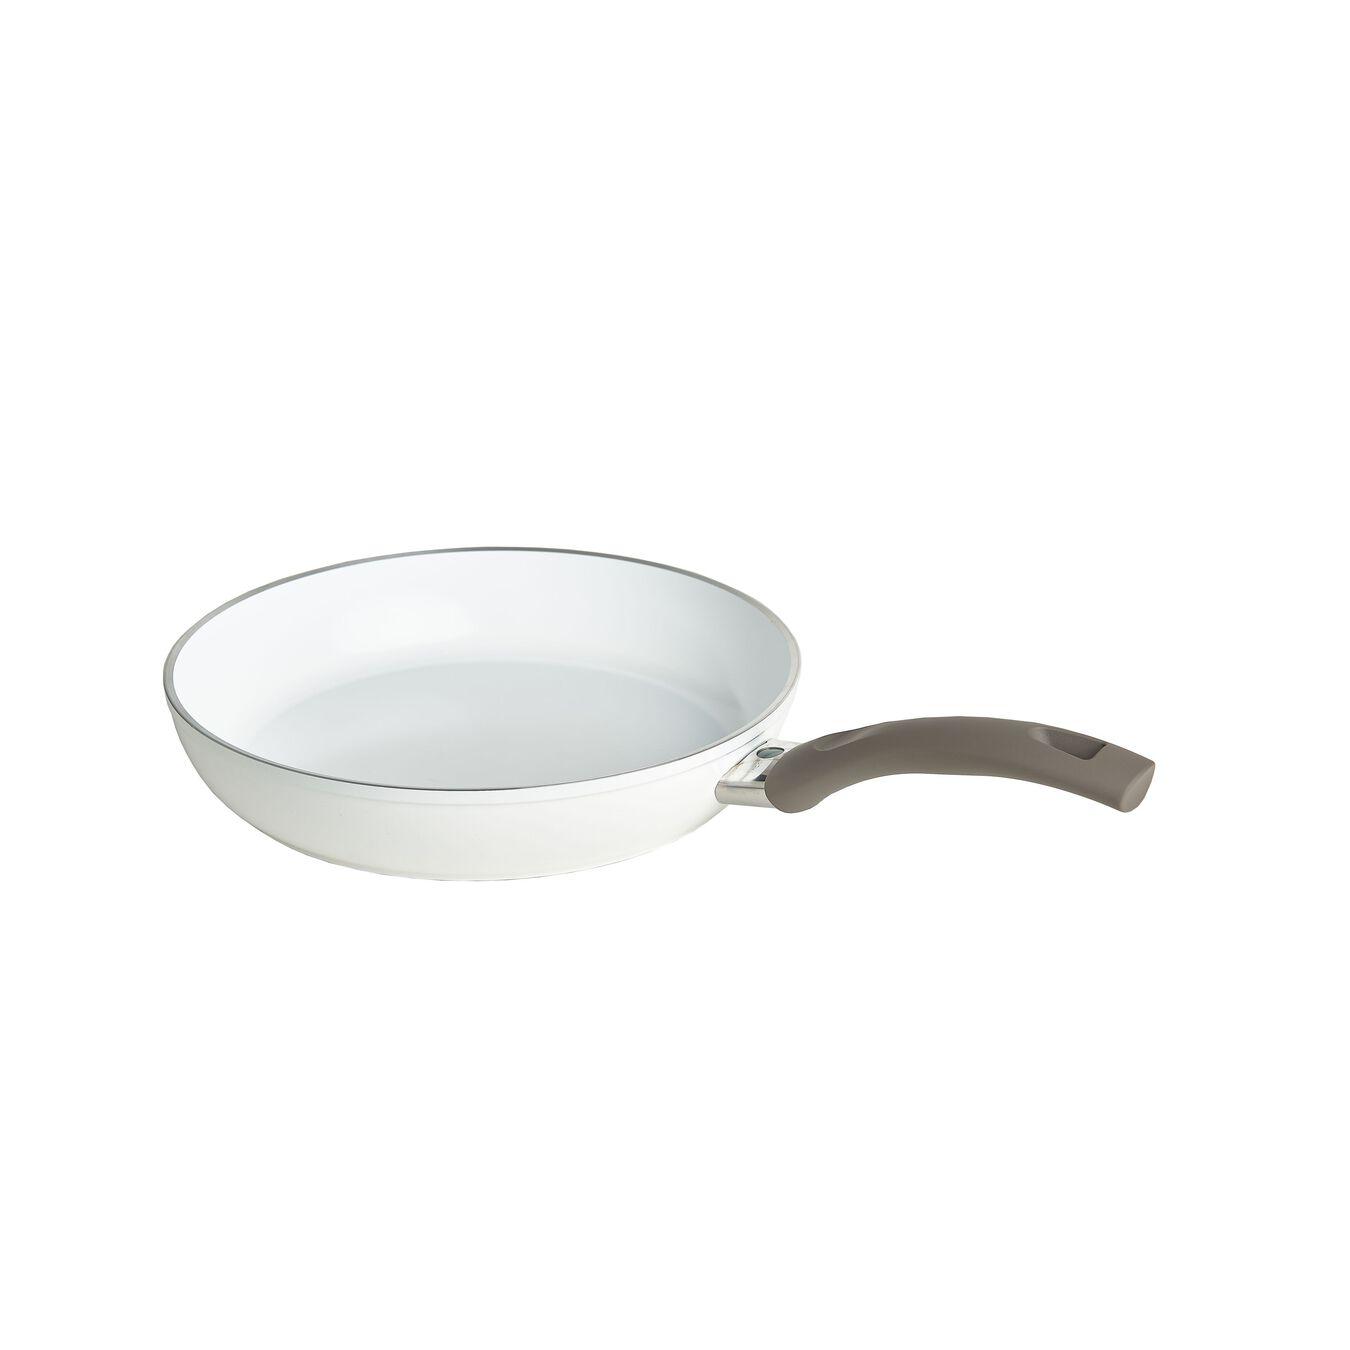 Poêle basse 28 cm, Aluminium, Blanc,,large 2